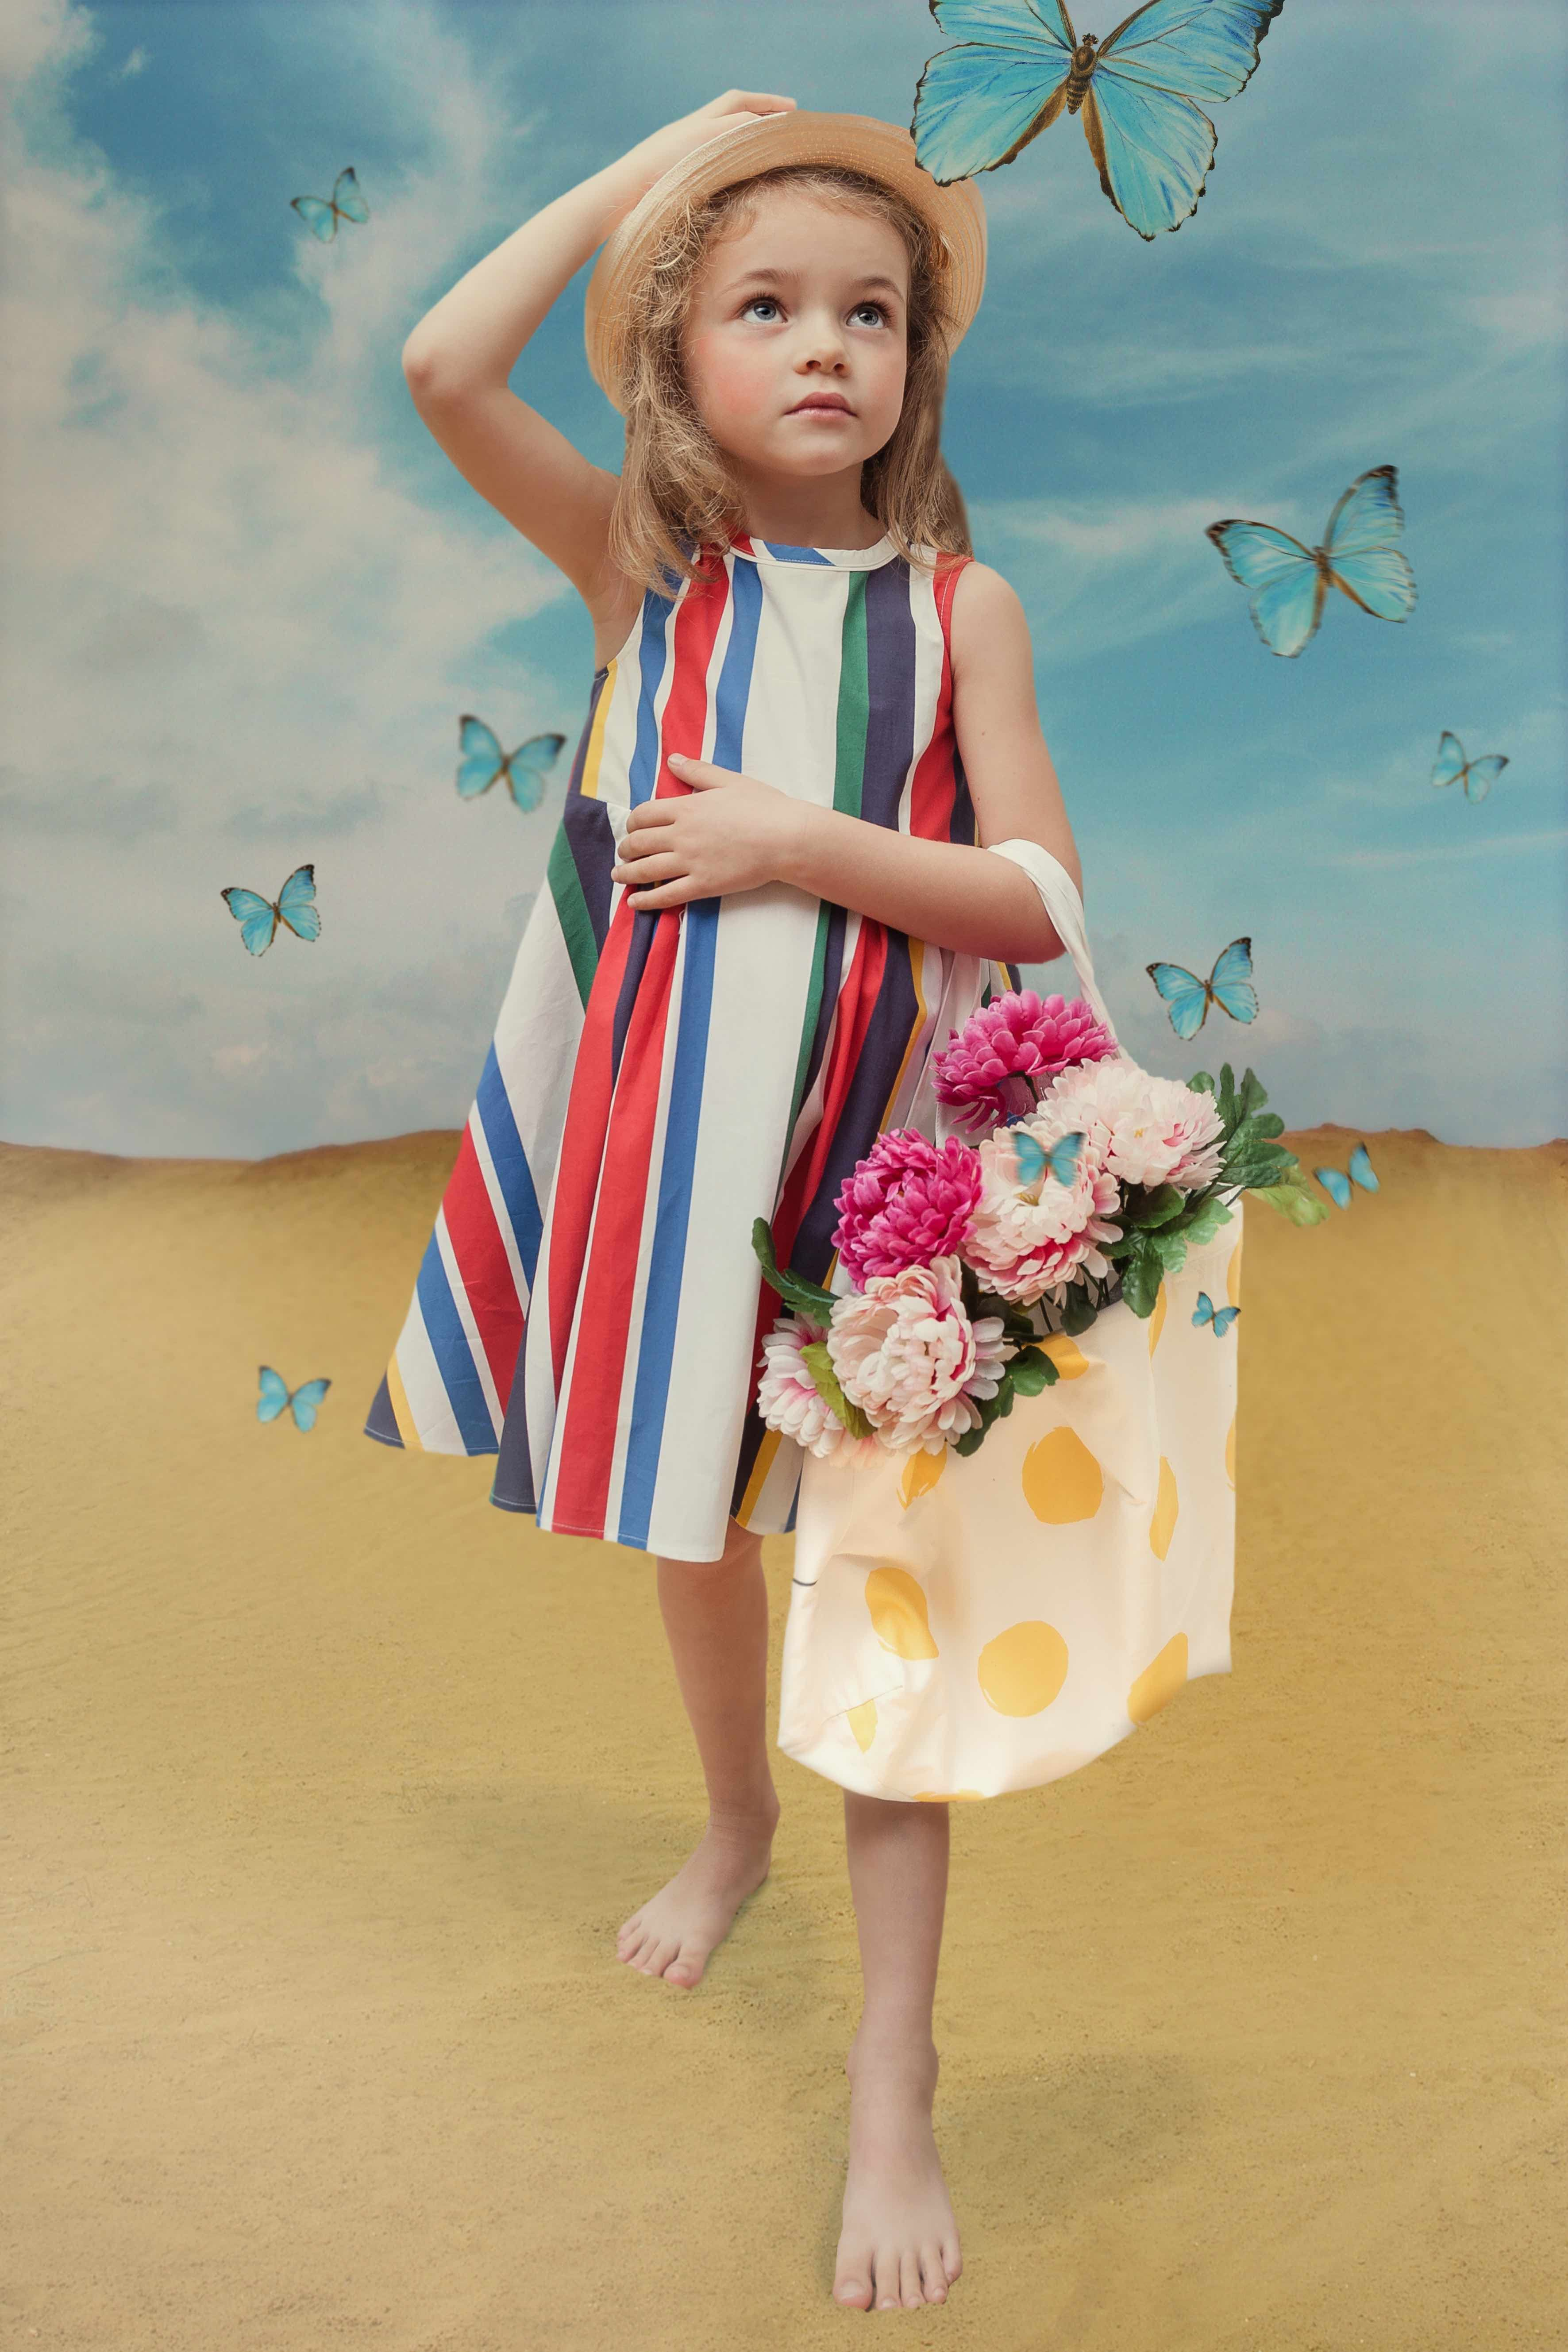 Summer Kids Wear, Wholesale Various High Quality Summer Kids Wear Products from Global Summer Kids Wear Suppliers and Summer Kids Wear Factory,Importer,Exporter at autoebookj1.ga